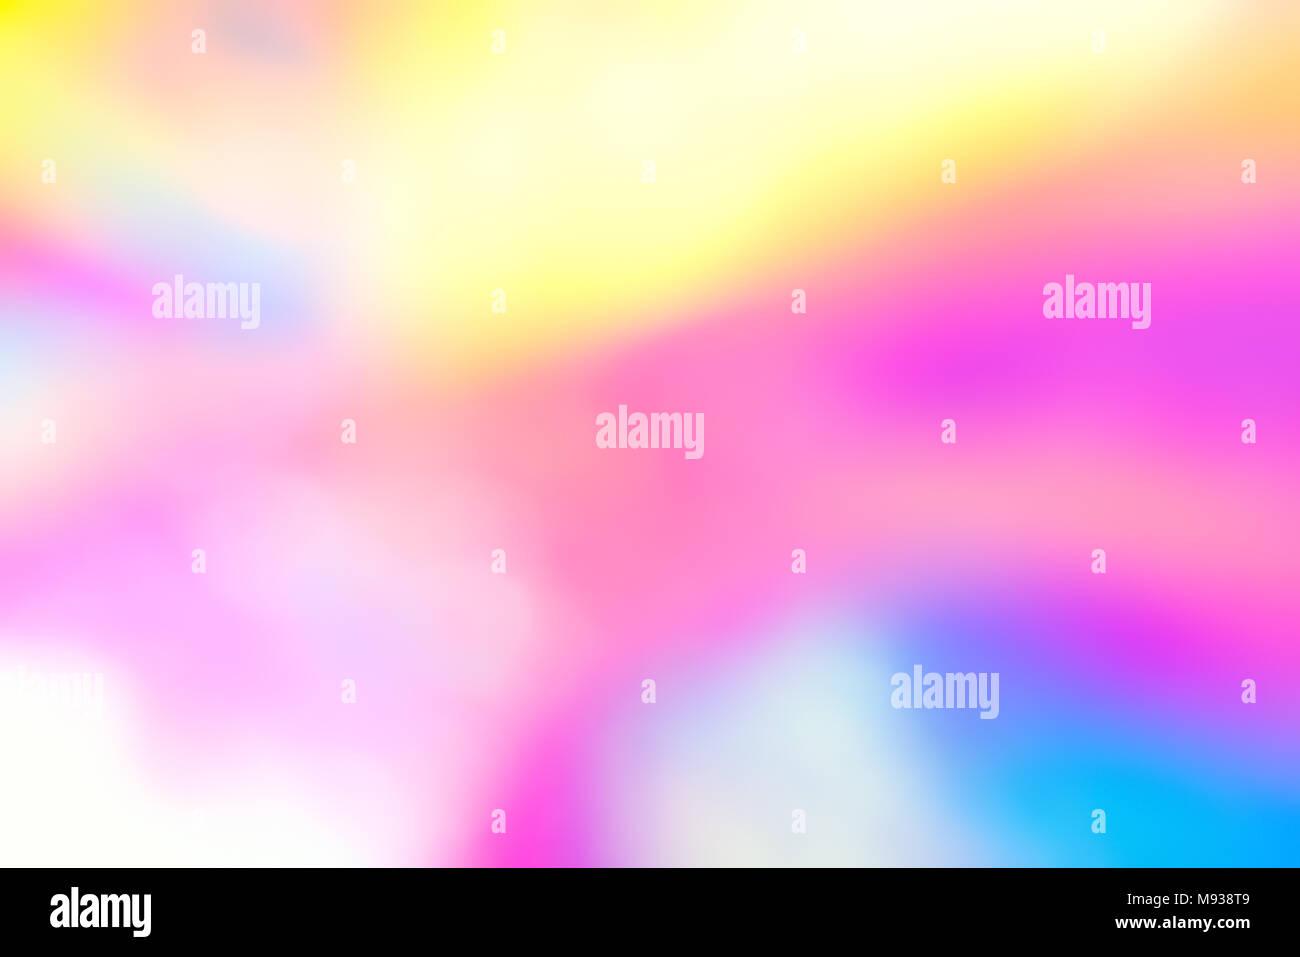 Holographic vibrant neon background. - Stock Image